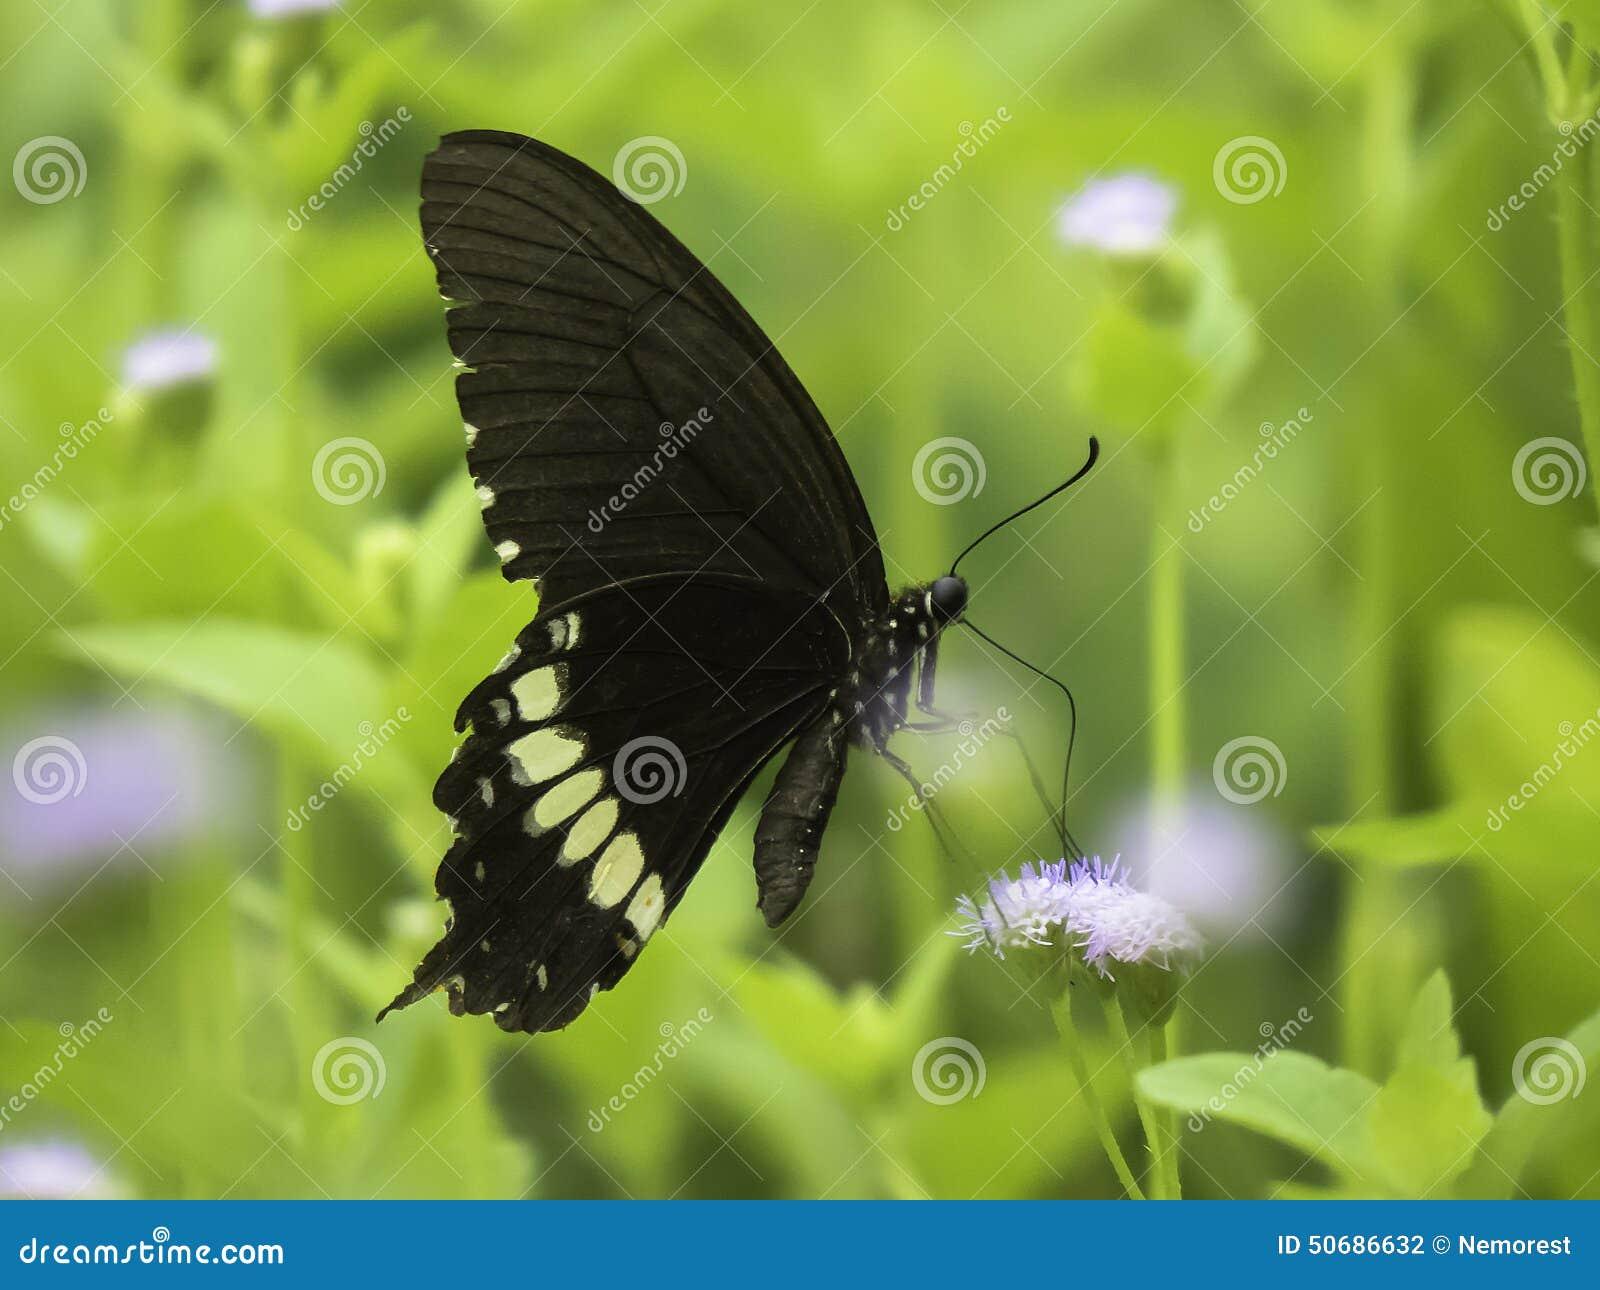 Download 蝴蝶 库存照片. 图片 包括有 农村, 栖所, 触手, beautifuler, 扩大化, 正横, 昆虫学 - 50686632